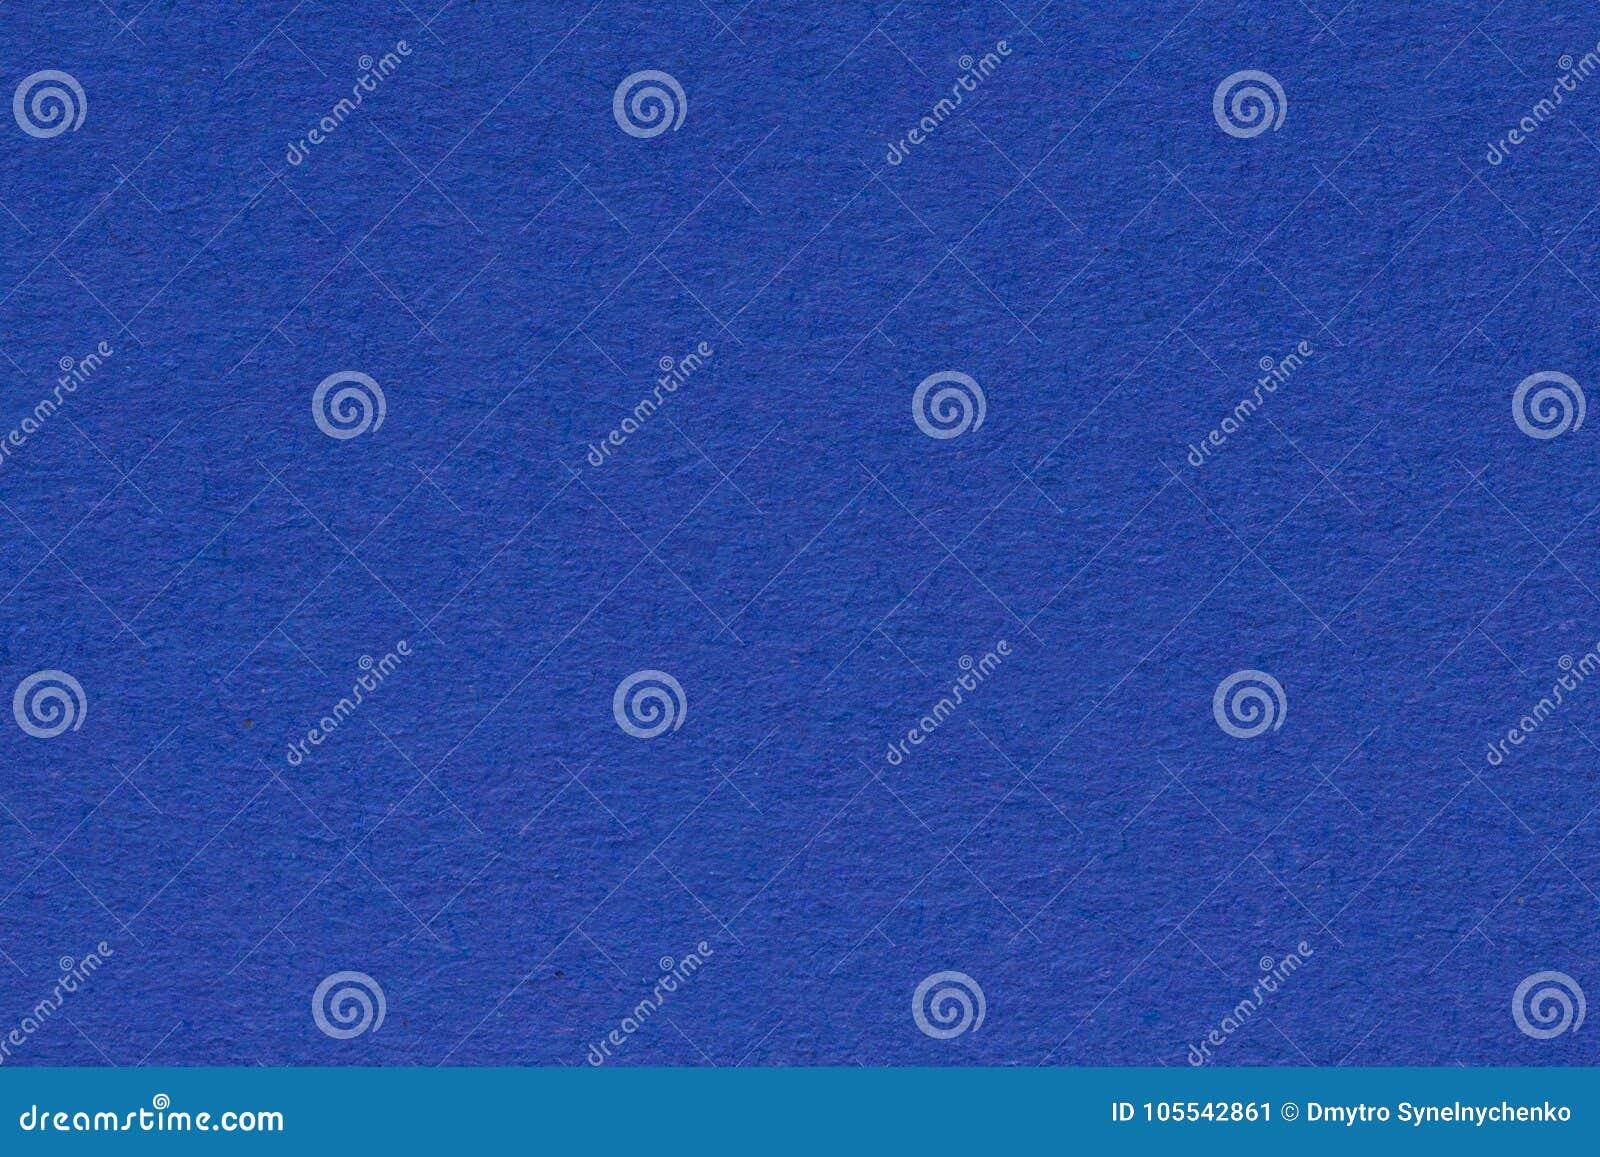 Videz, seulement fond bleu foncé et profond